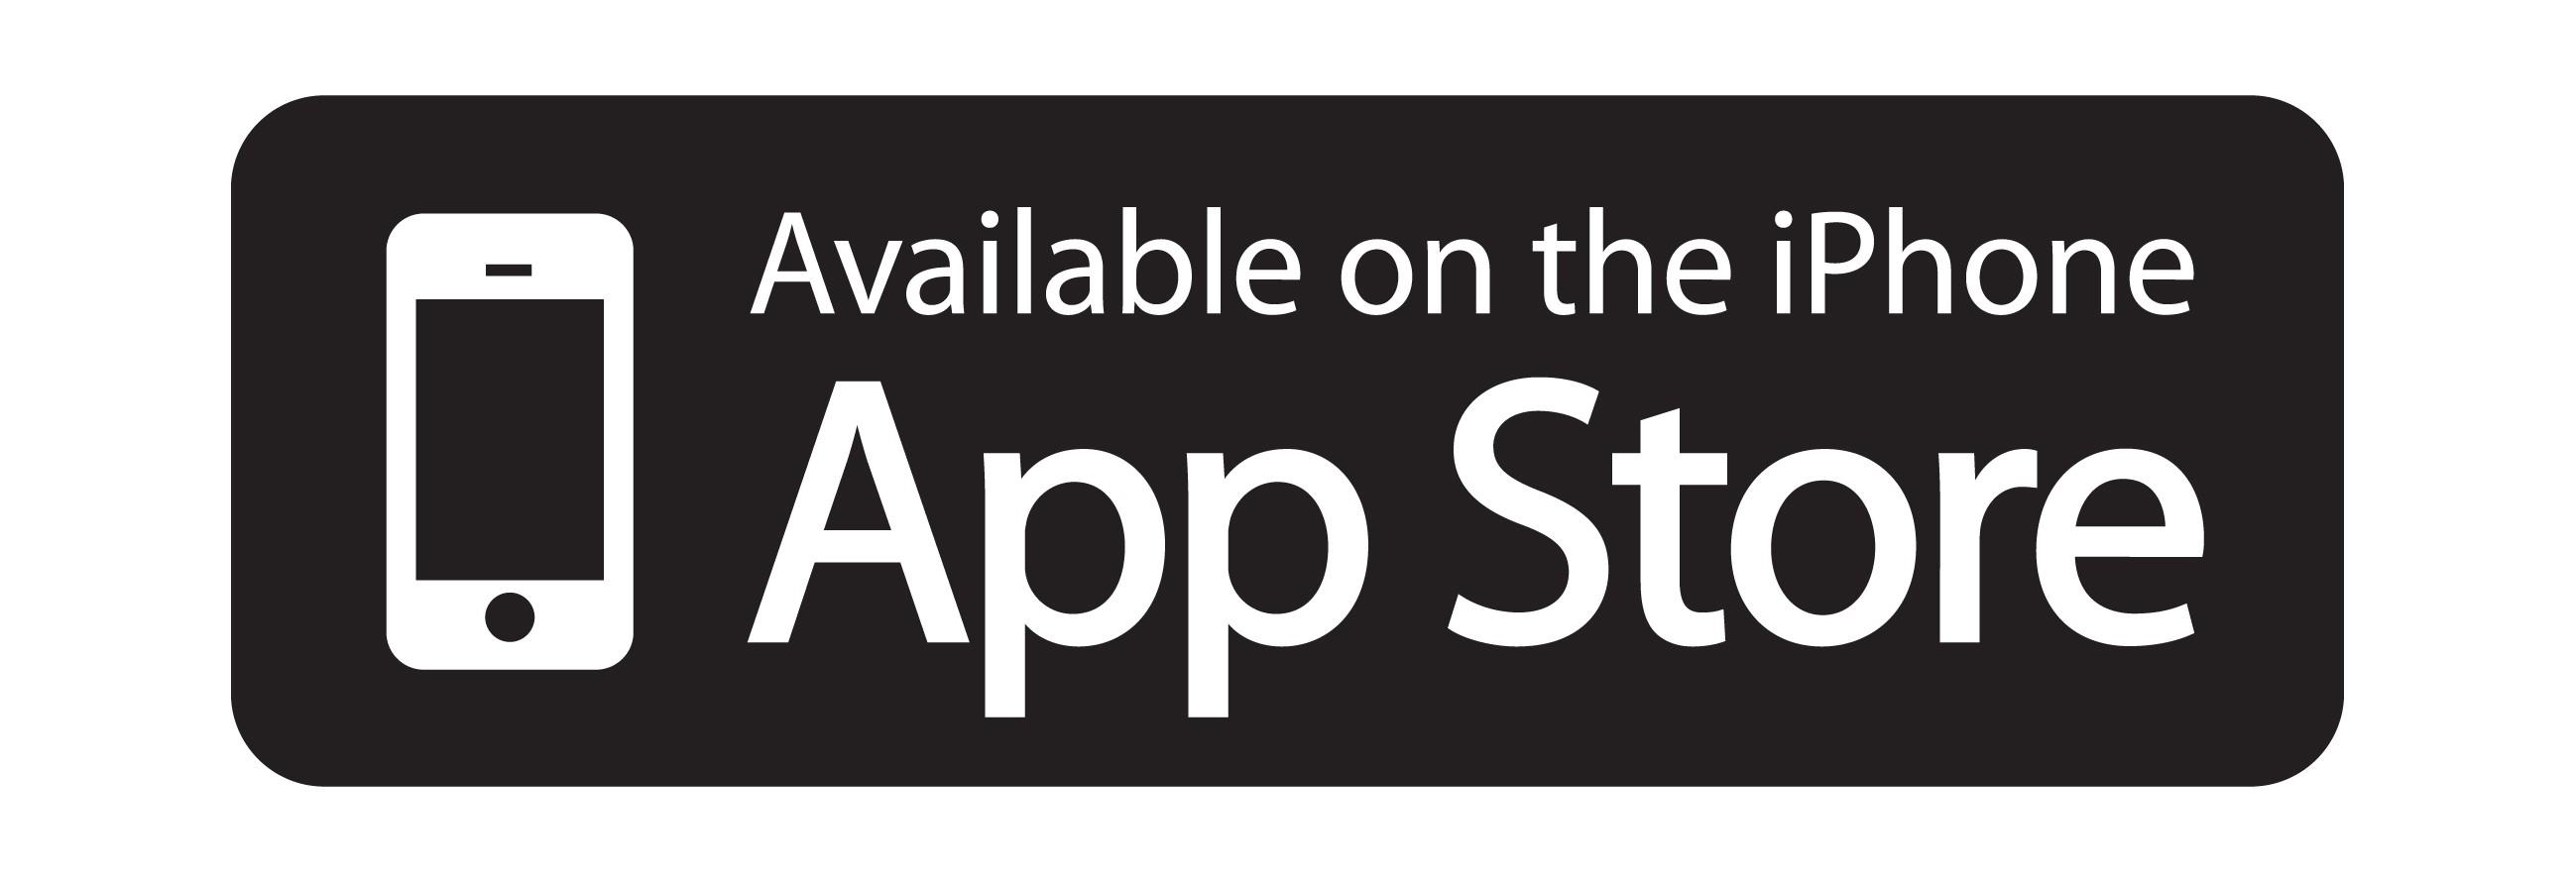 Idrinksmarter Mobile Phone App